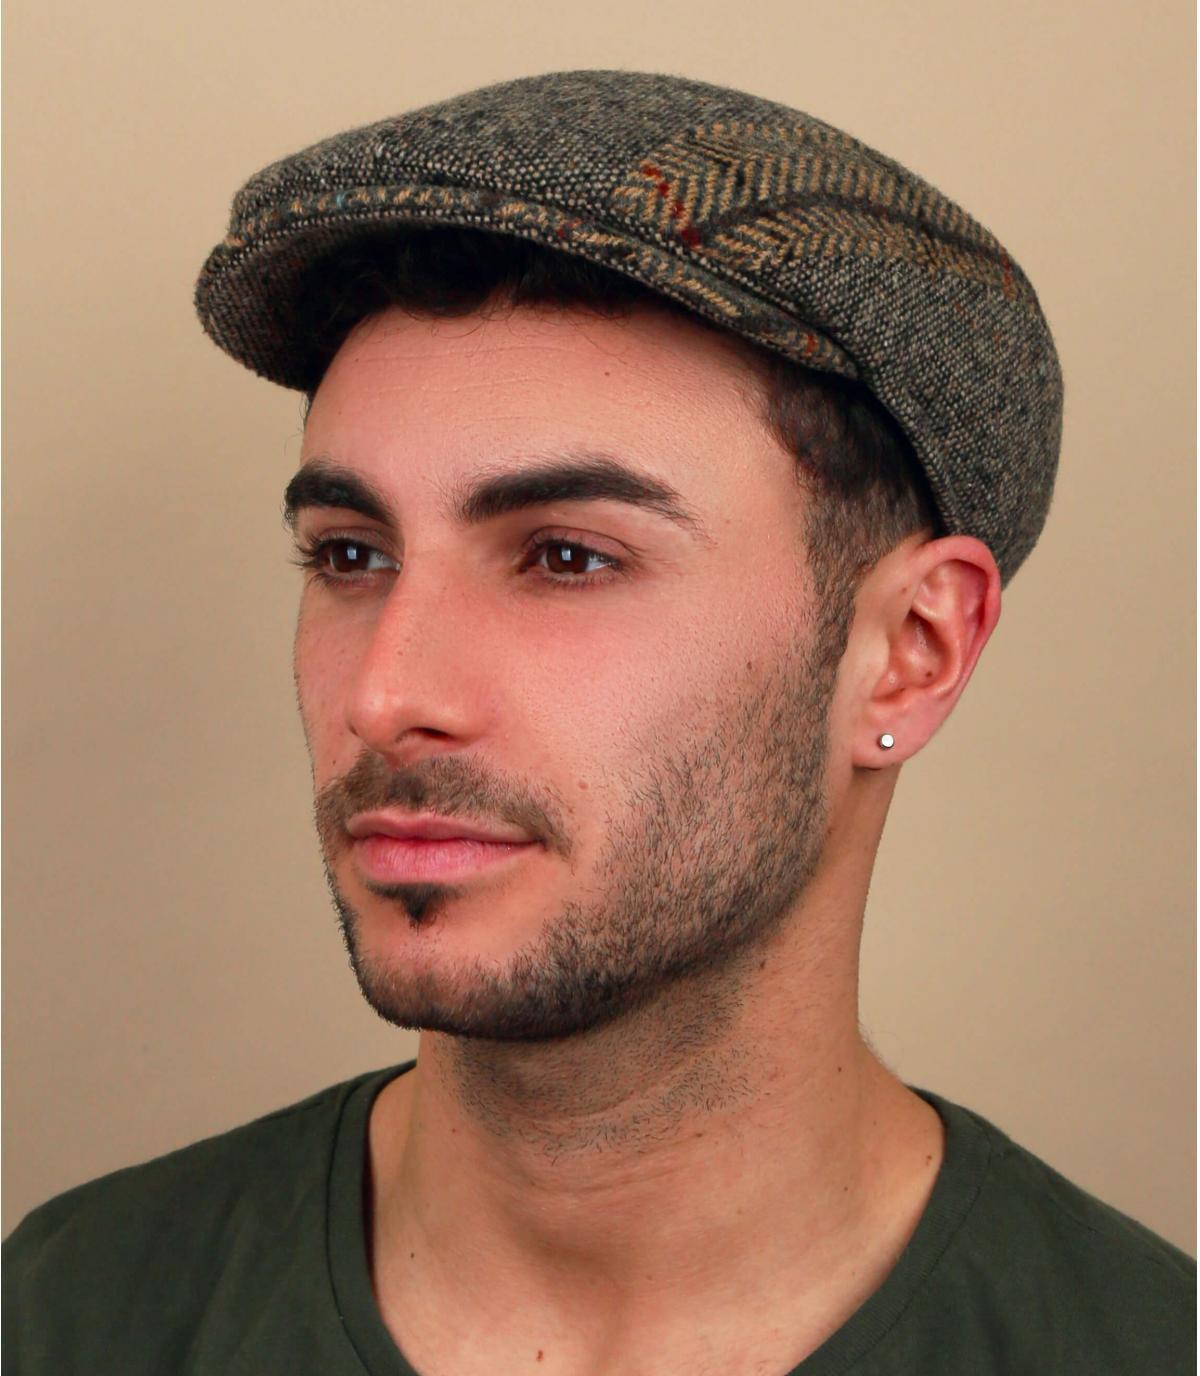 heather beige wool cap